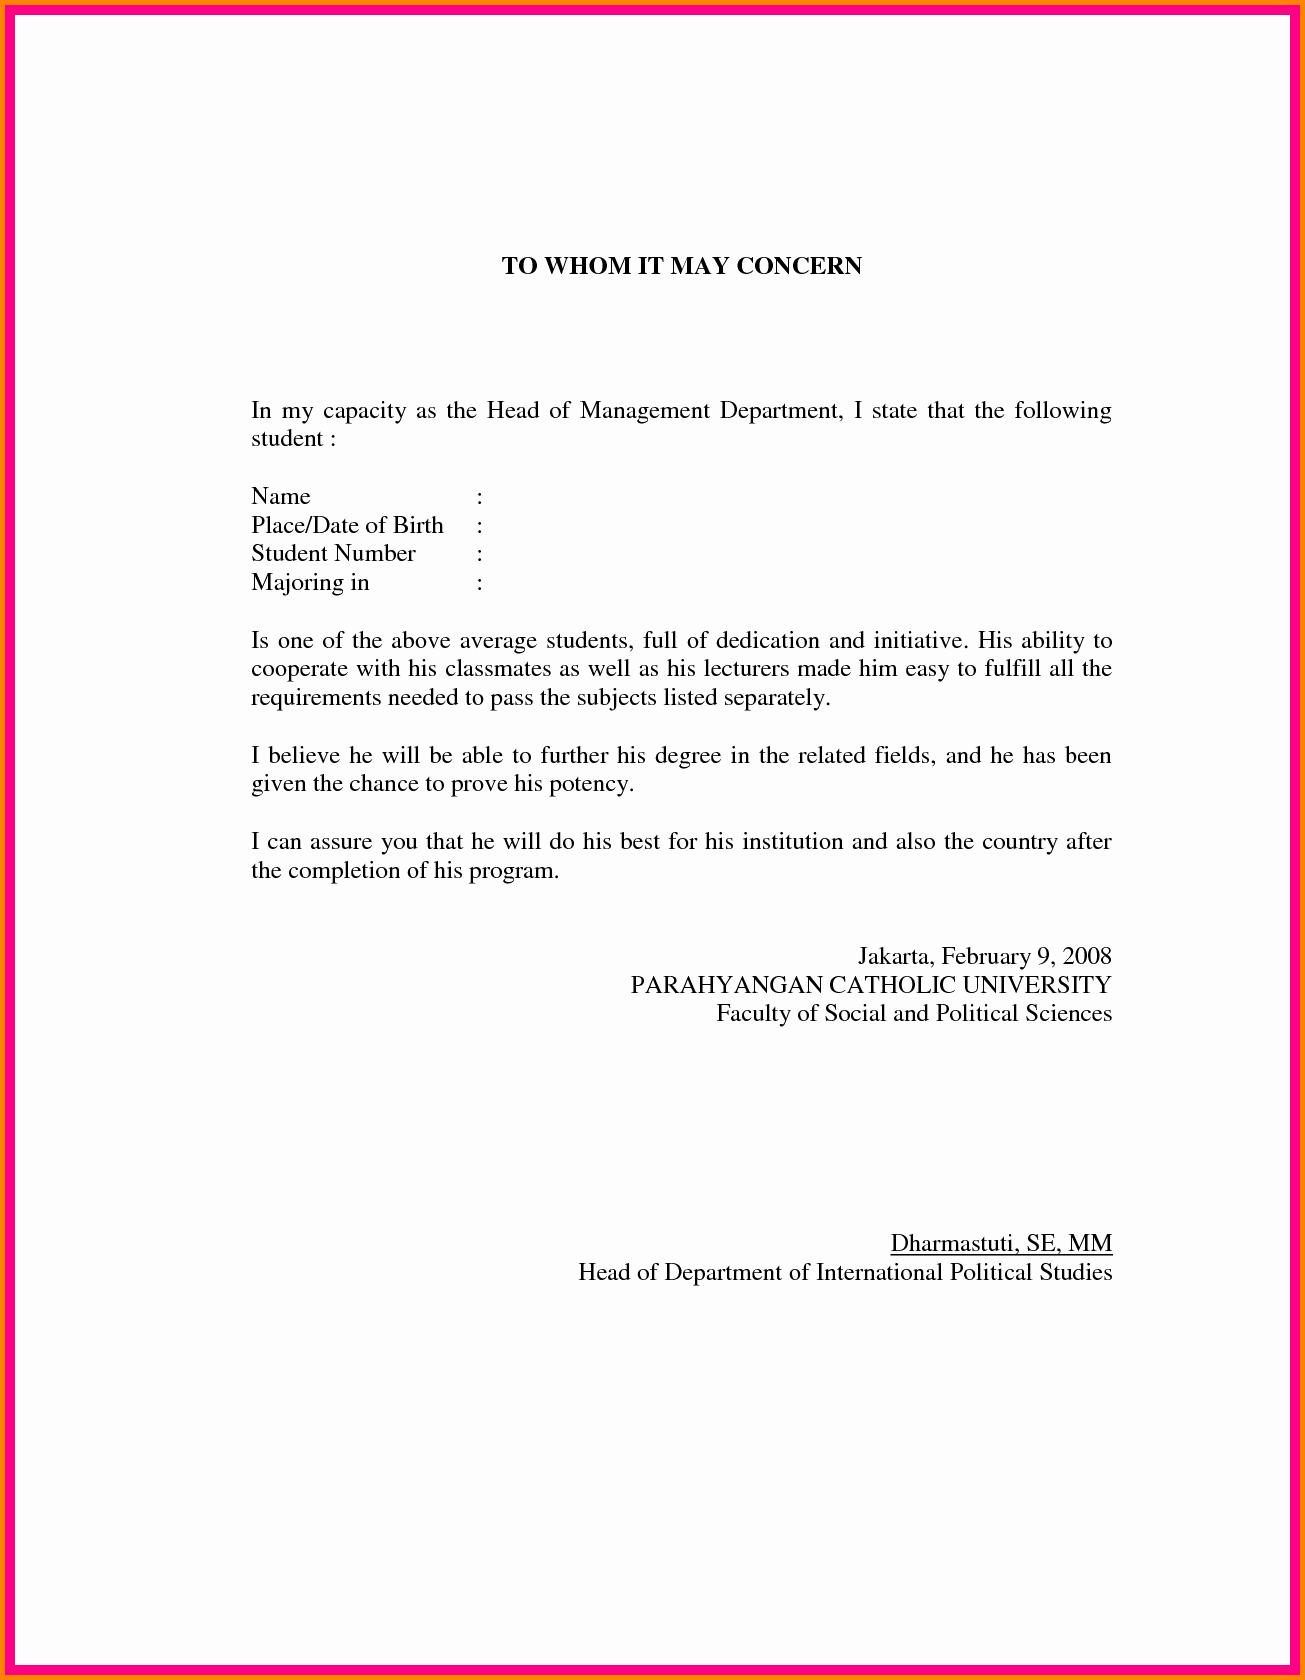 Format Of A Recomendation Letter Elegant Letter Of Re Mendation format Sample Template